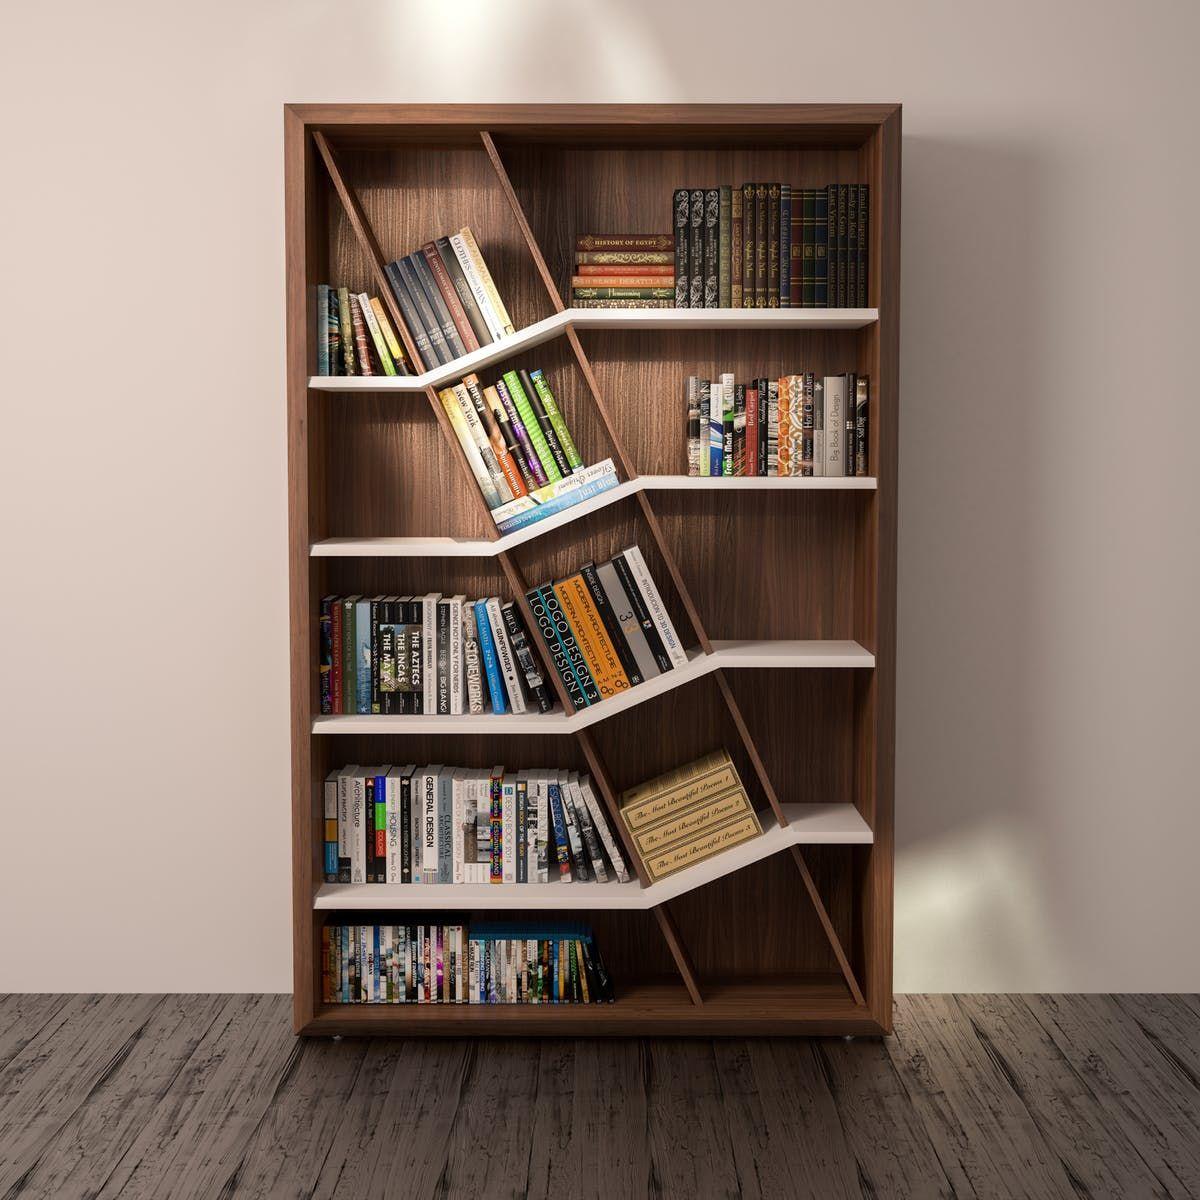 Loculamentum The Revival Of The Classic Bookcase Schwarzmann Llc Archinect Bookshelves Diy Bookshelf Design Creative Bookshelves